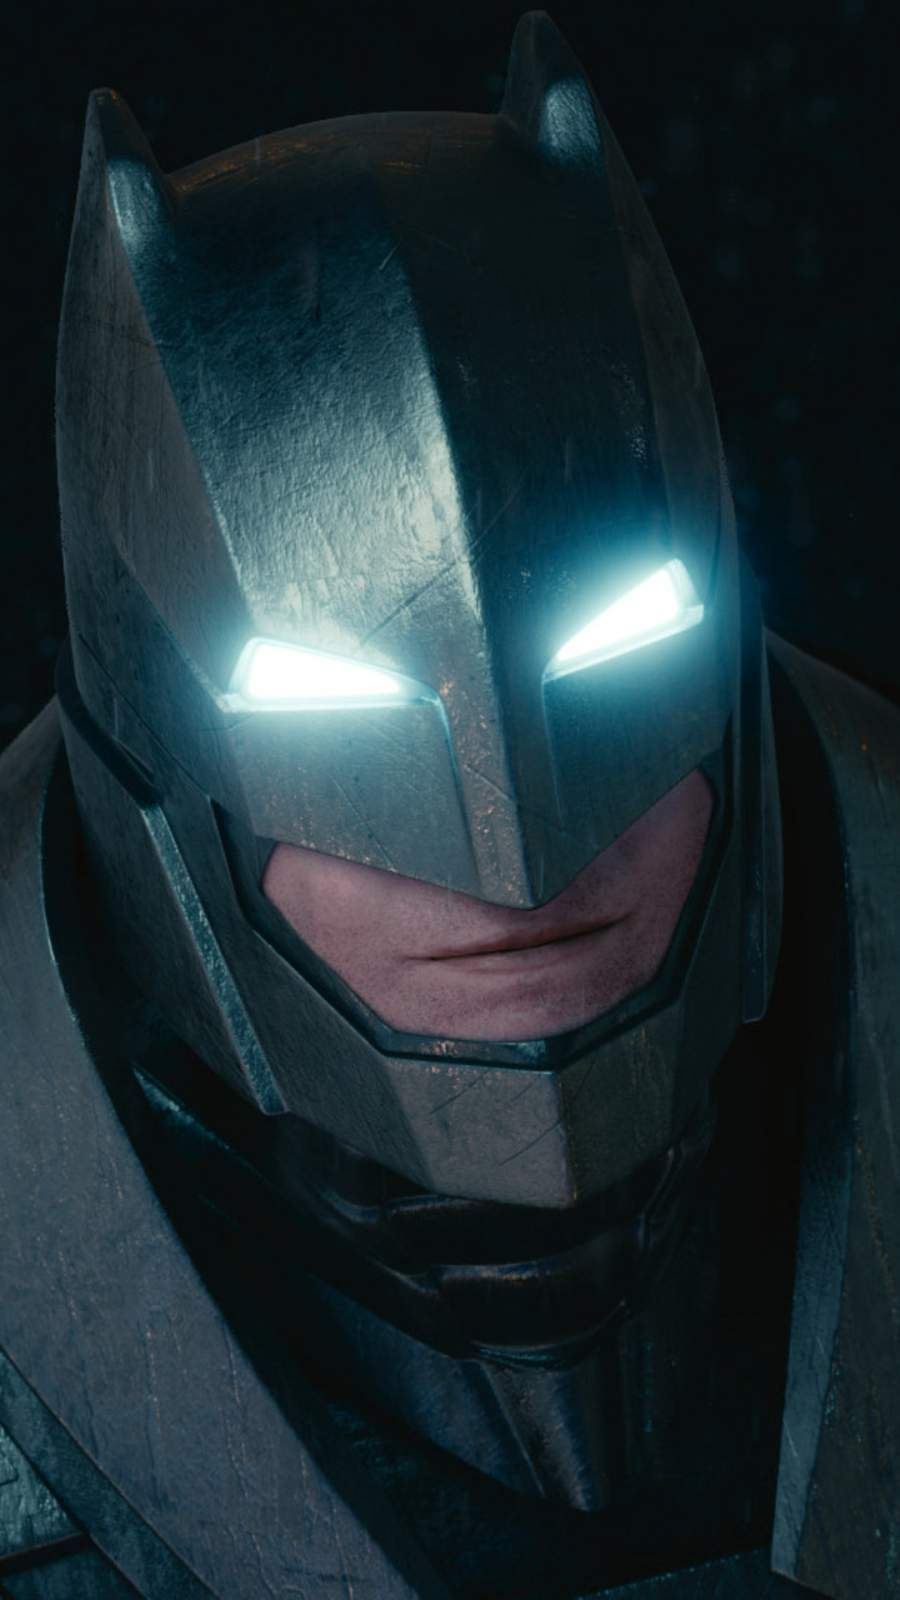 Batman Armor iPhone Wallpaper